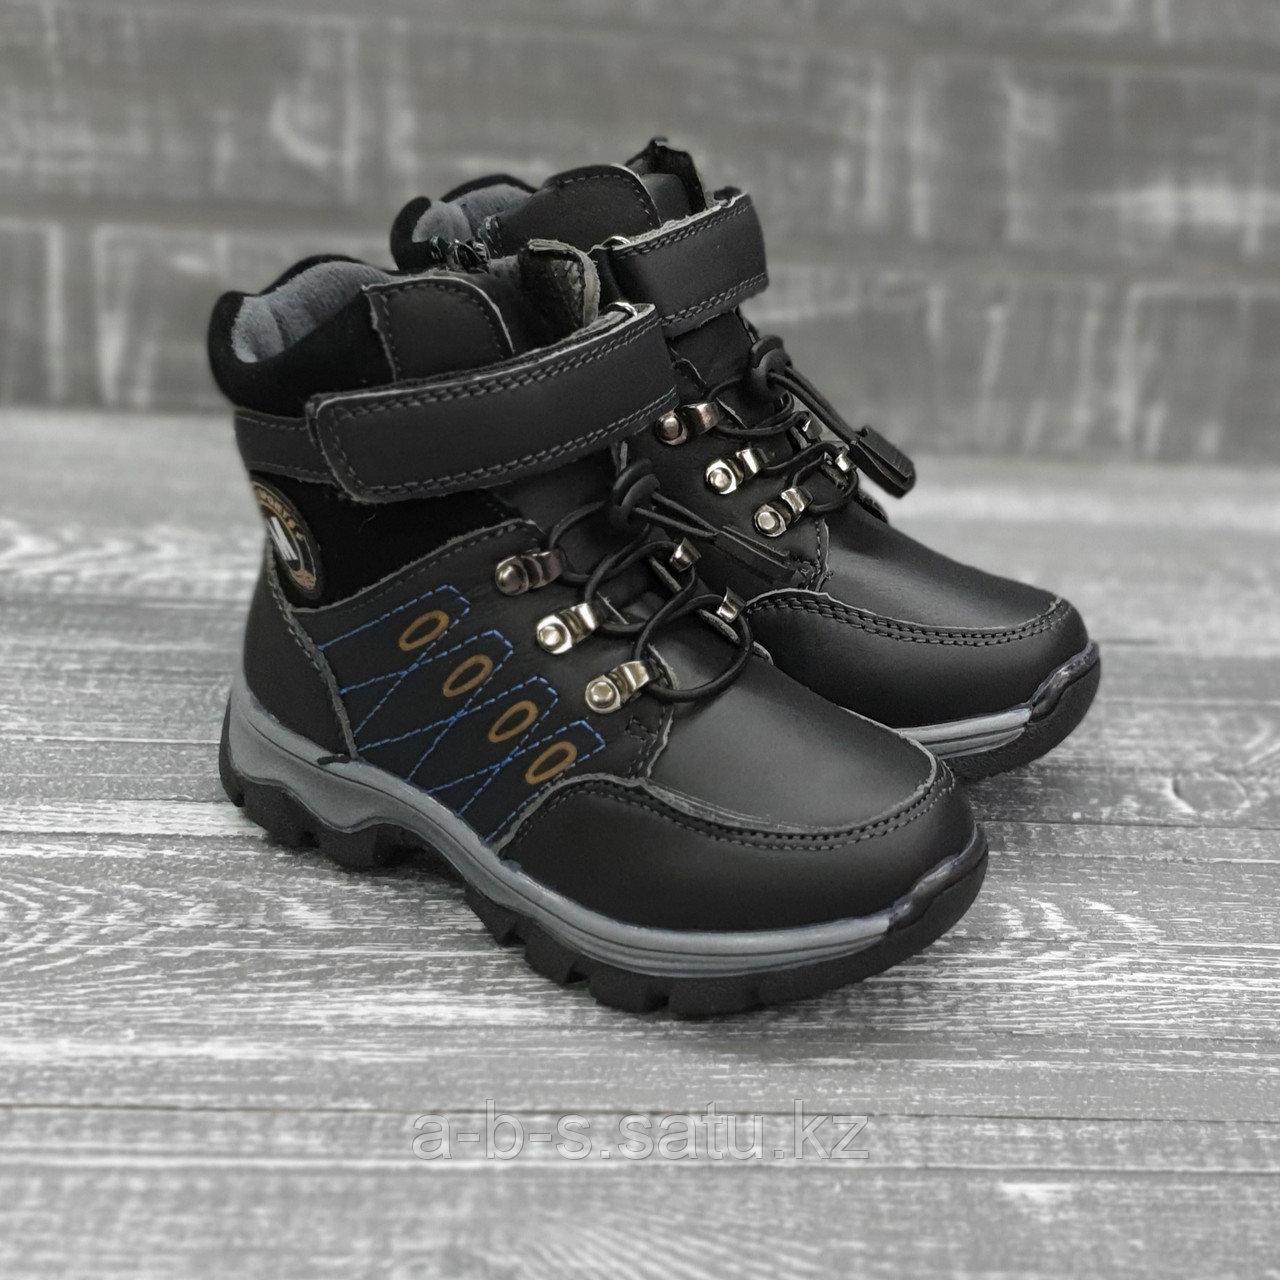 Ботинки из натуральной кожи (со шнурками)